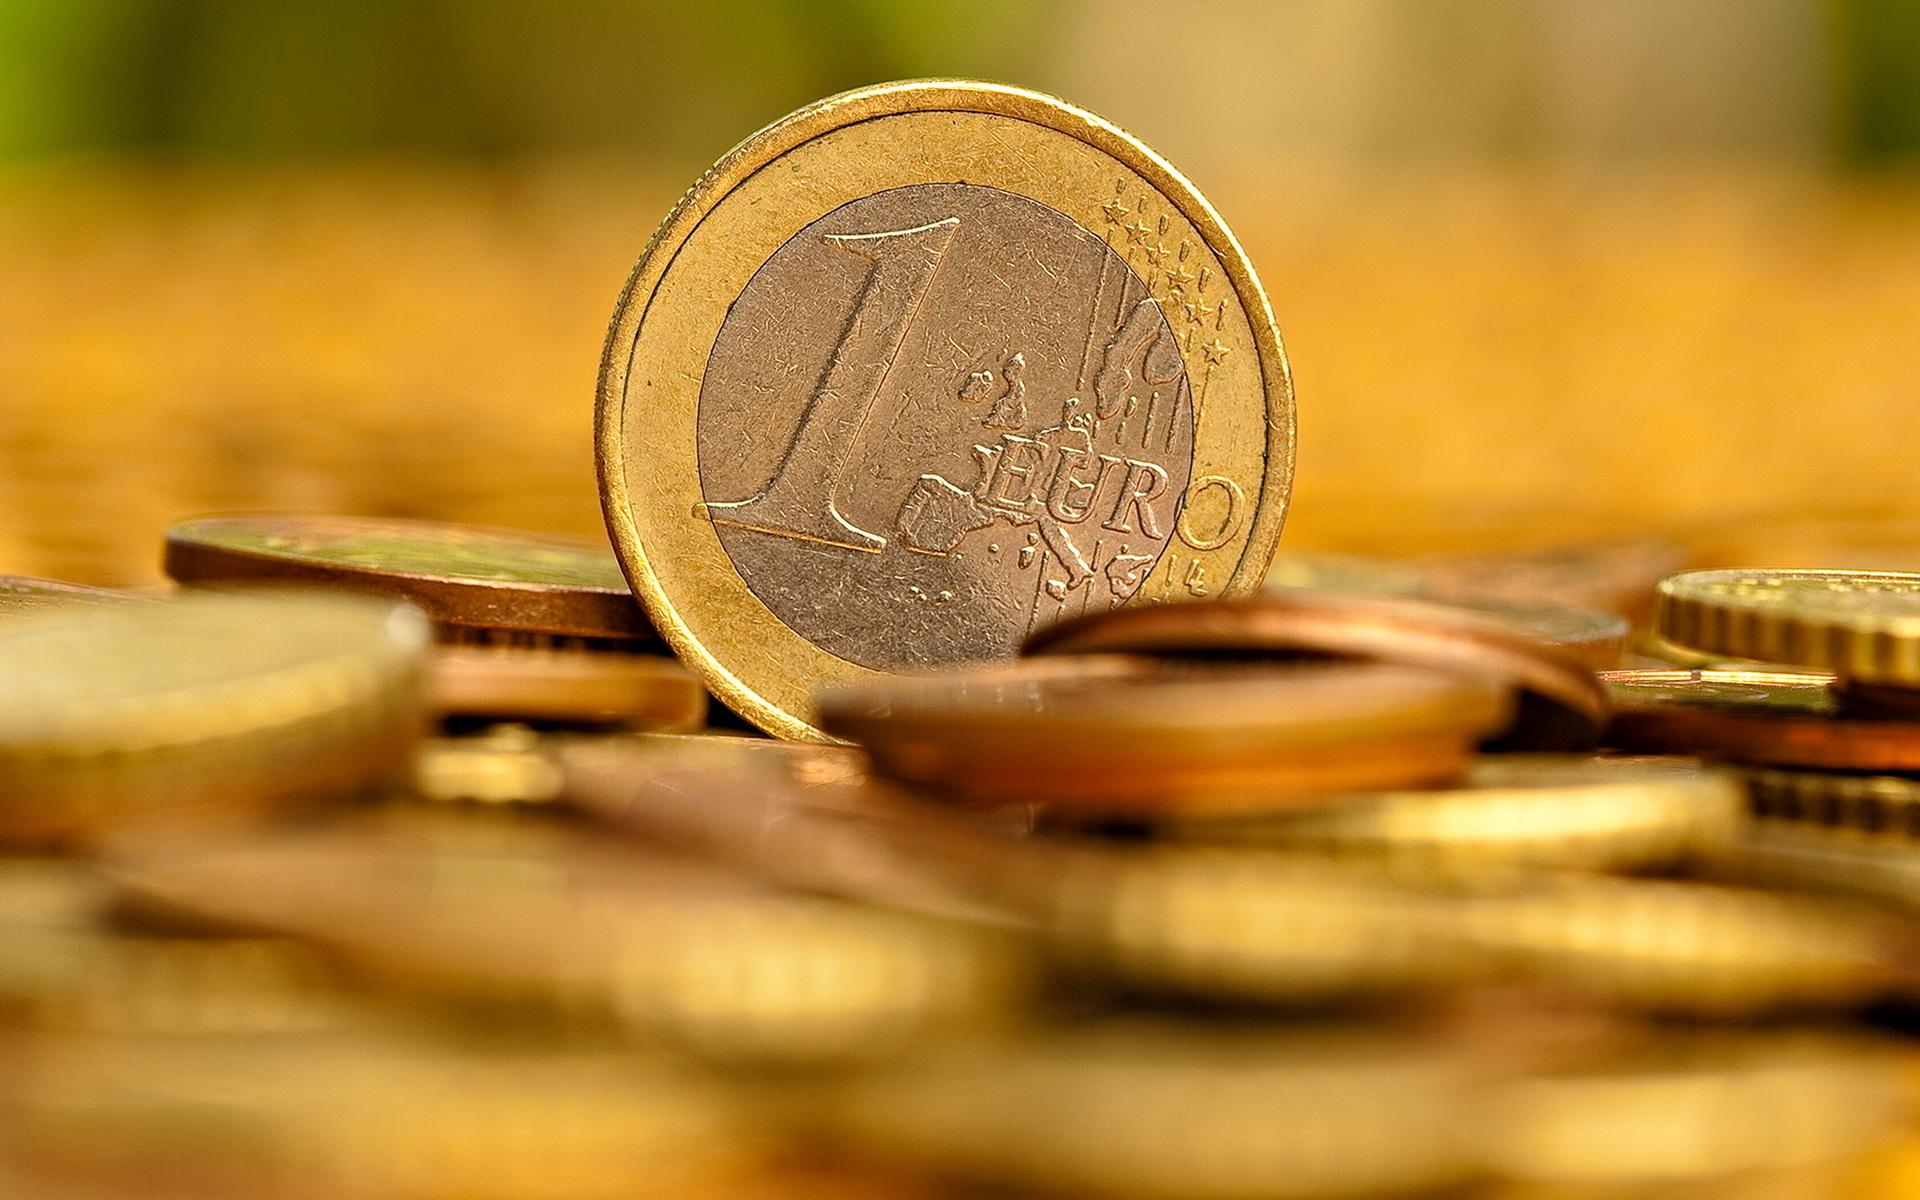 https://www.blog4ever-fichiers.com/2015/02/795389/Finance_Wallpapers_Money_One_euro_028682_.jpg